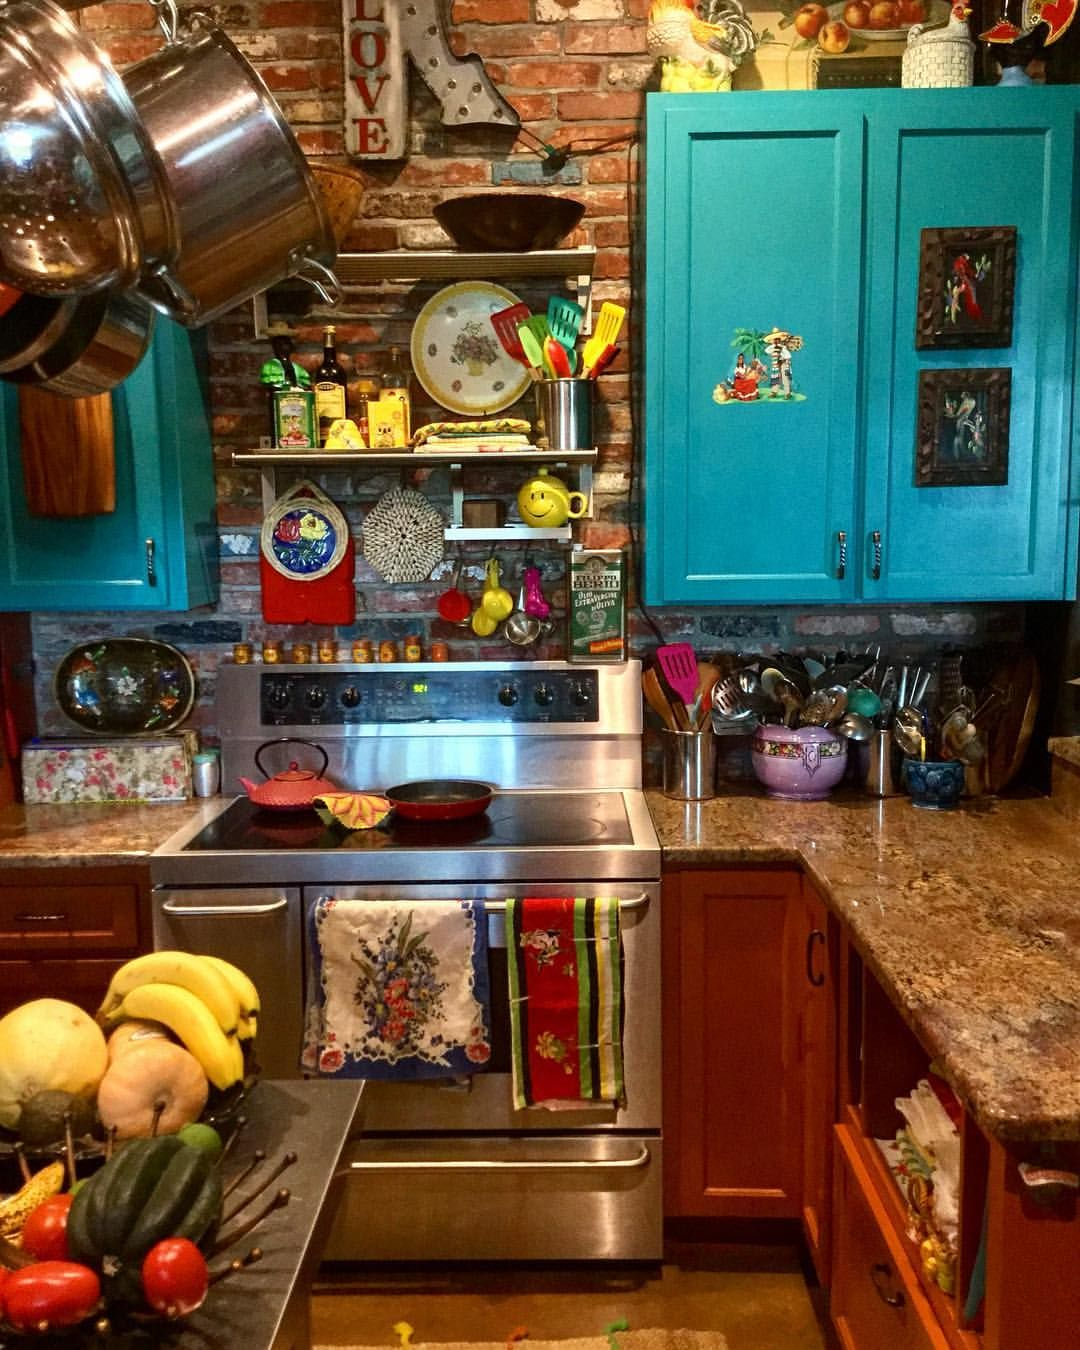 cucina-americana-bohemien